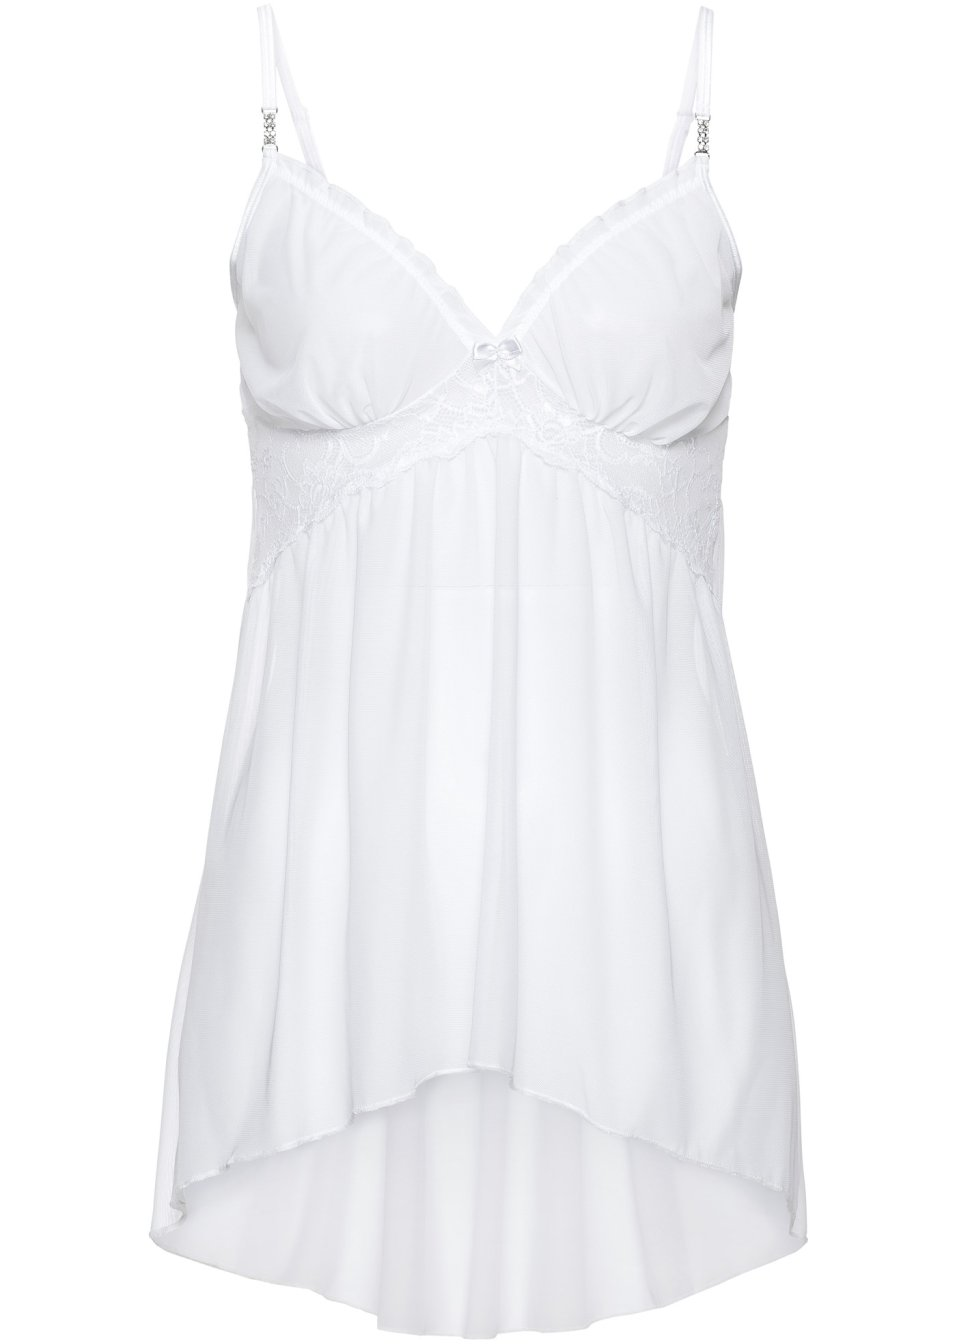 erotiska underkläder dam lamai